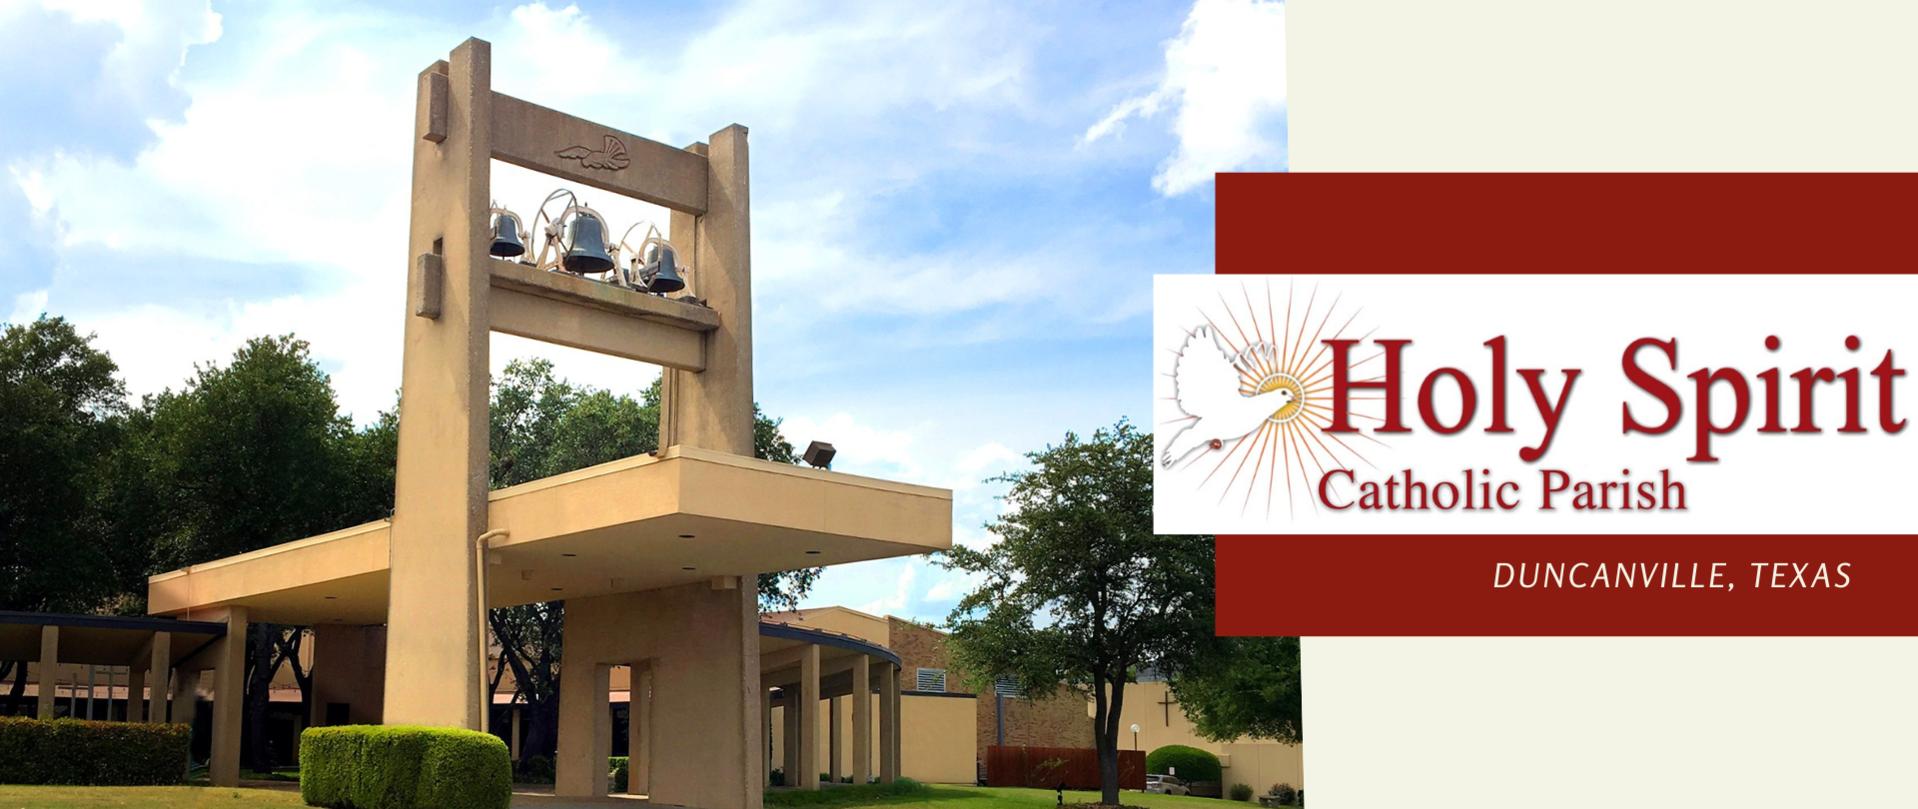 hscc-web-banner